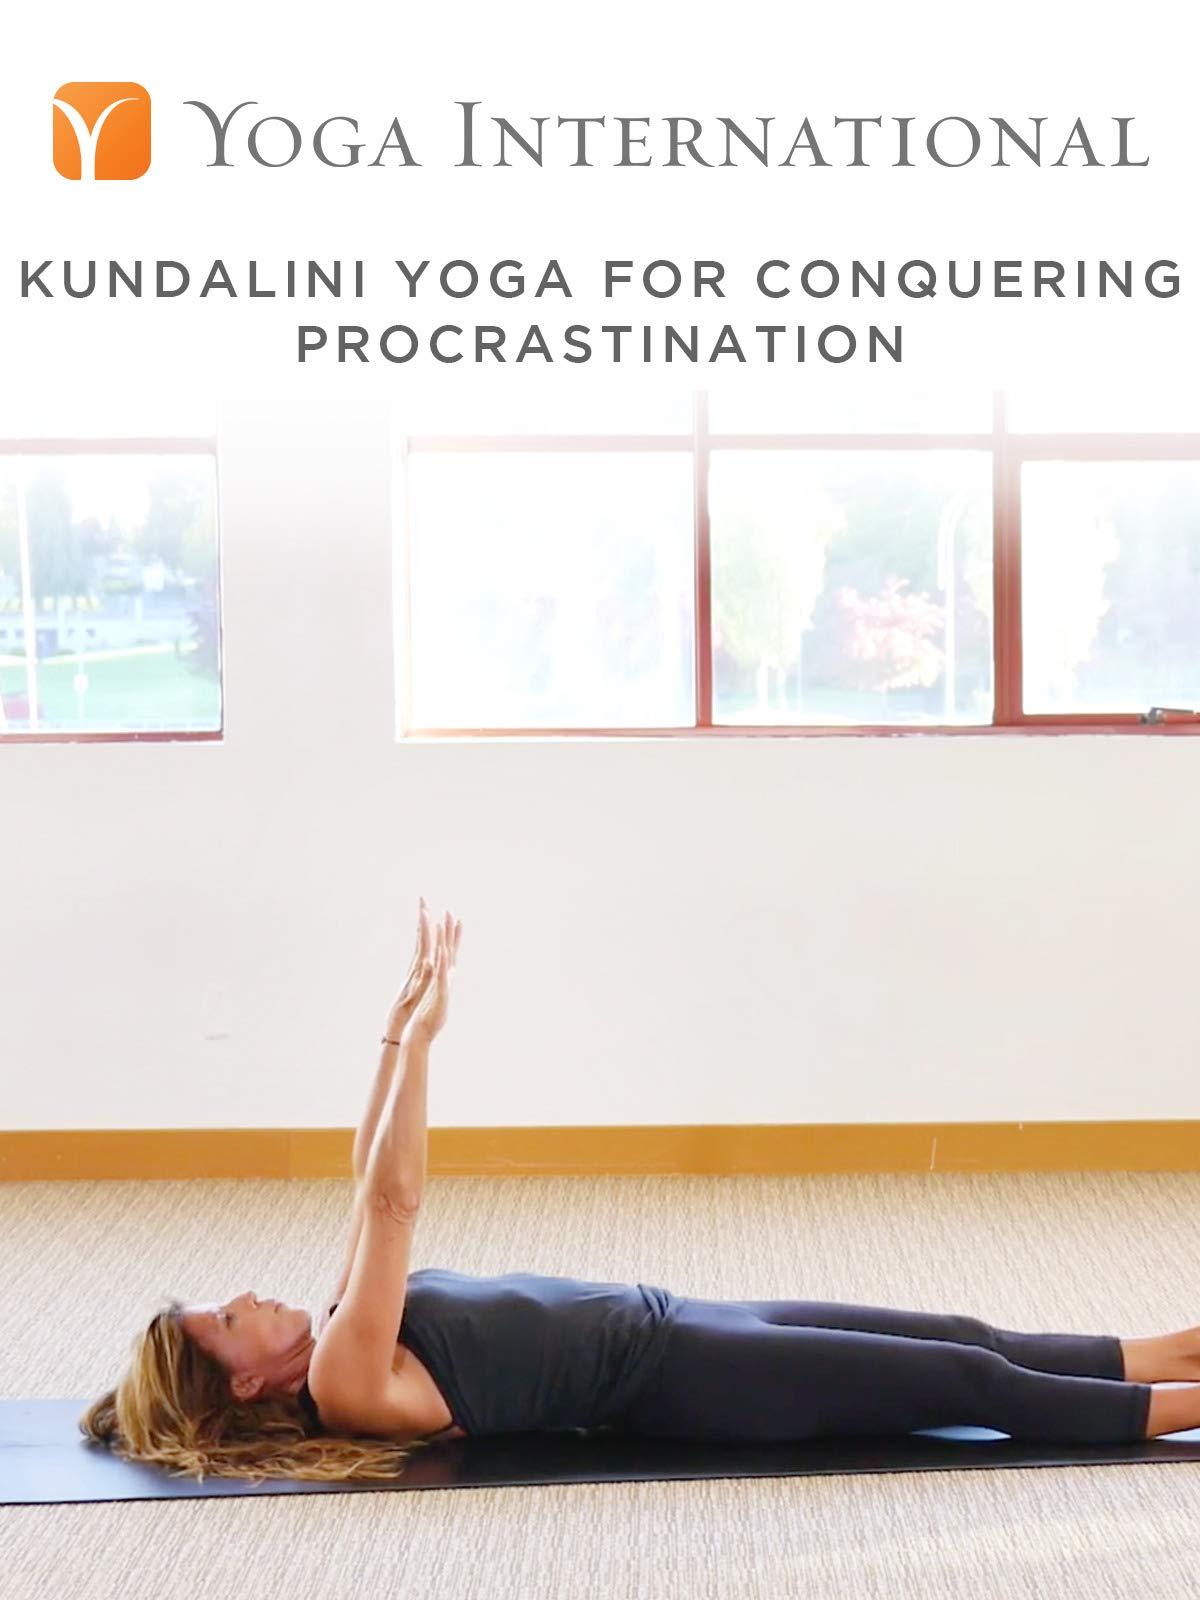 Kundalini Yoga for Conquering Procrastination